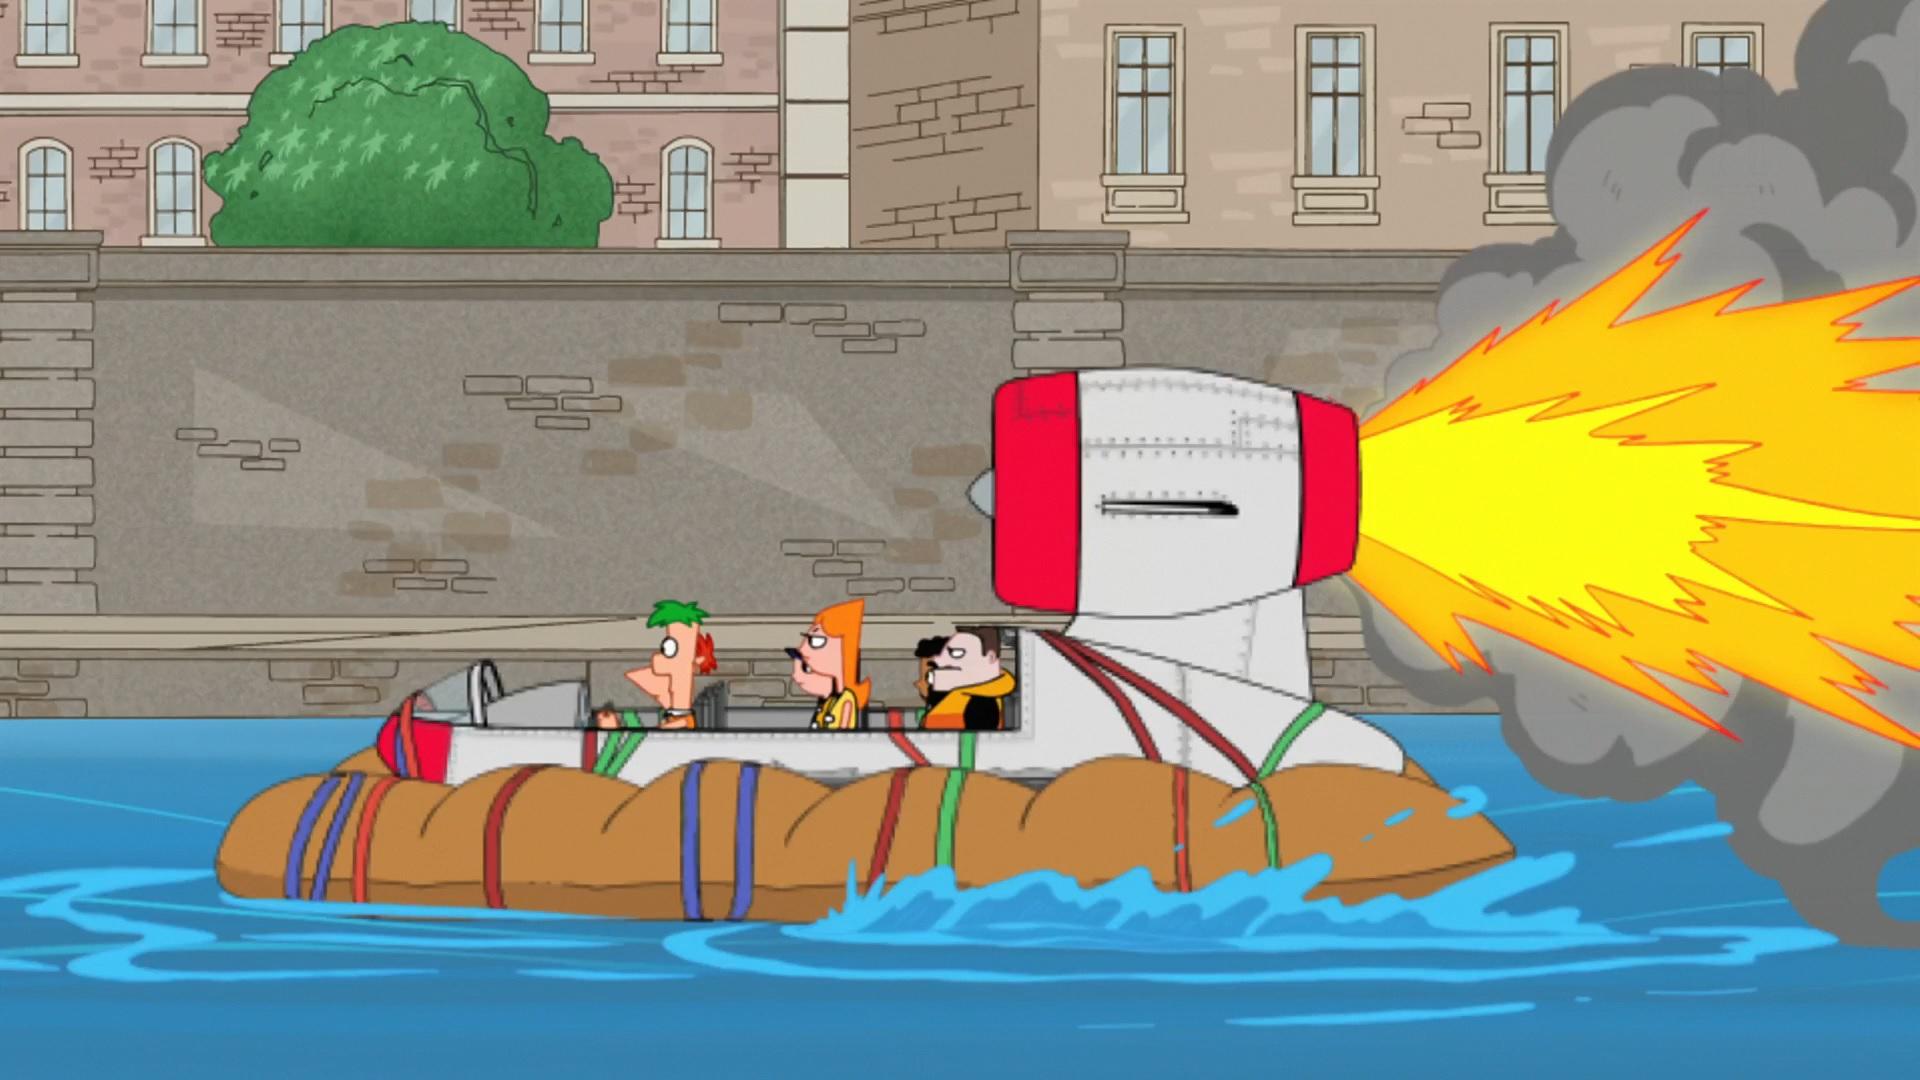 File:Team Phineas Rafting Through Venice.jpg